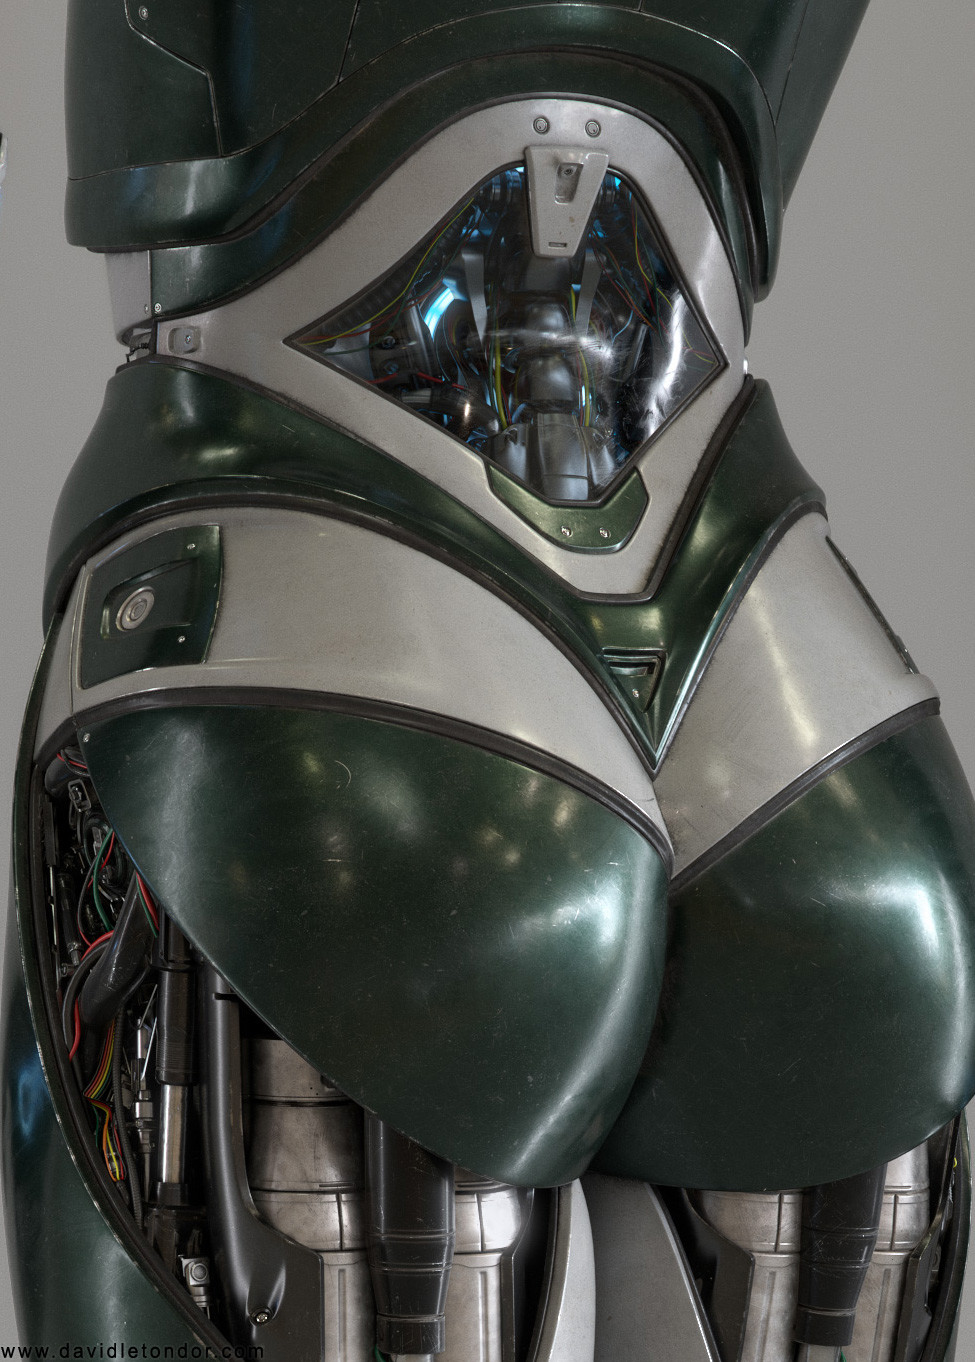 David letondor robotskin david letondor v22